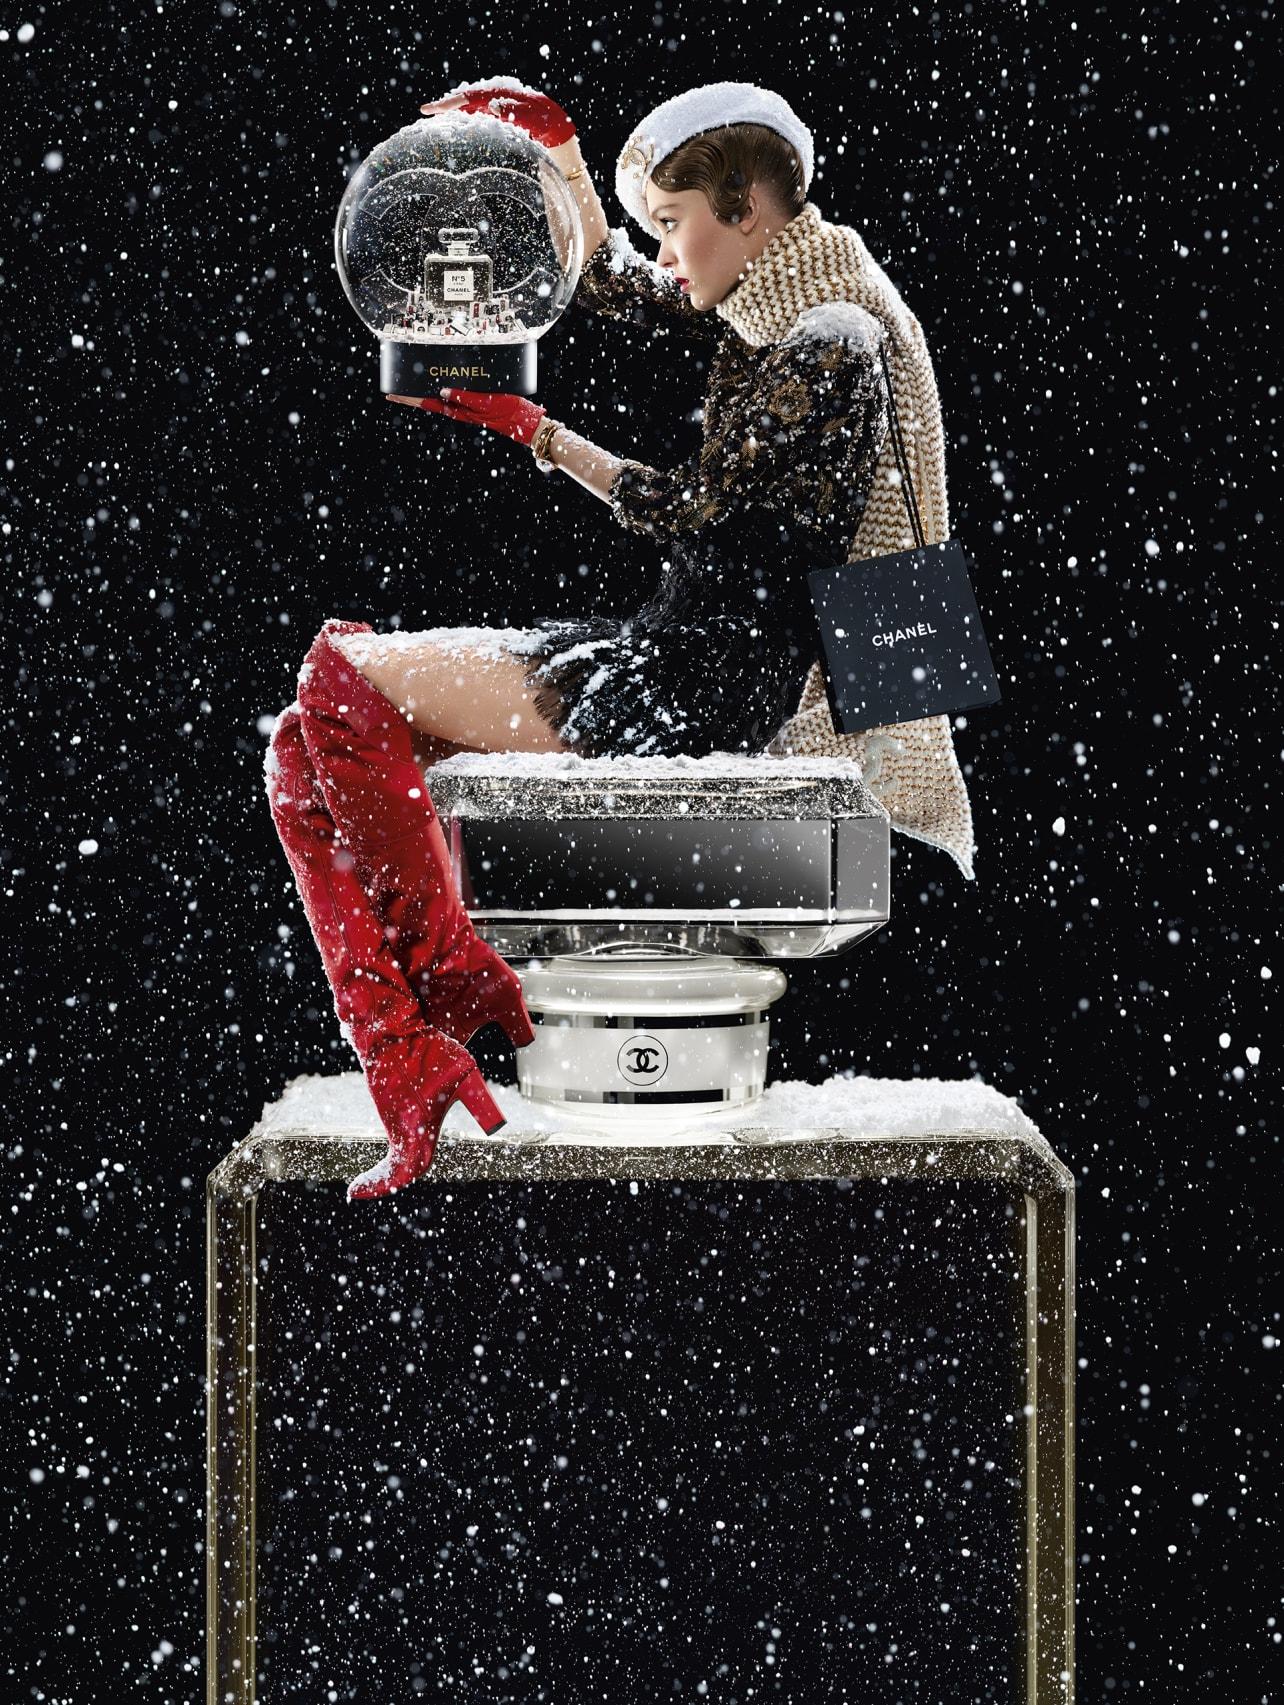 официальный сайт Chanel мода парфюмерия уход за кожей